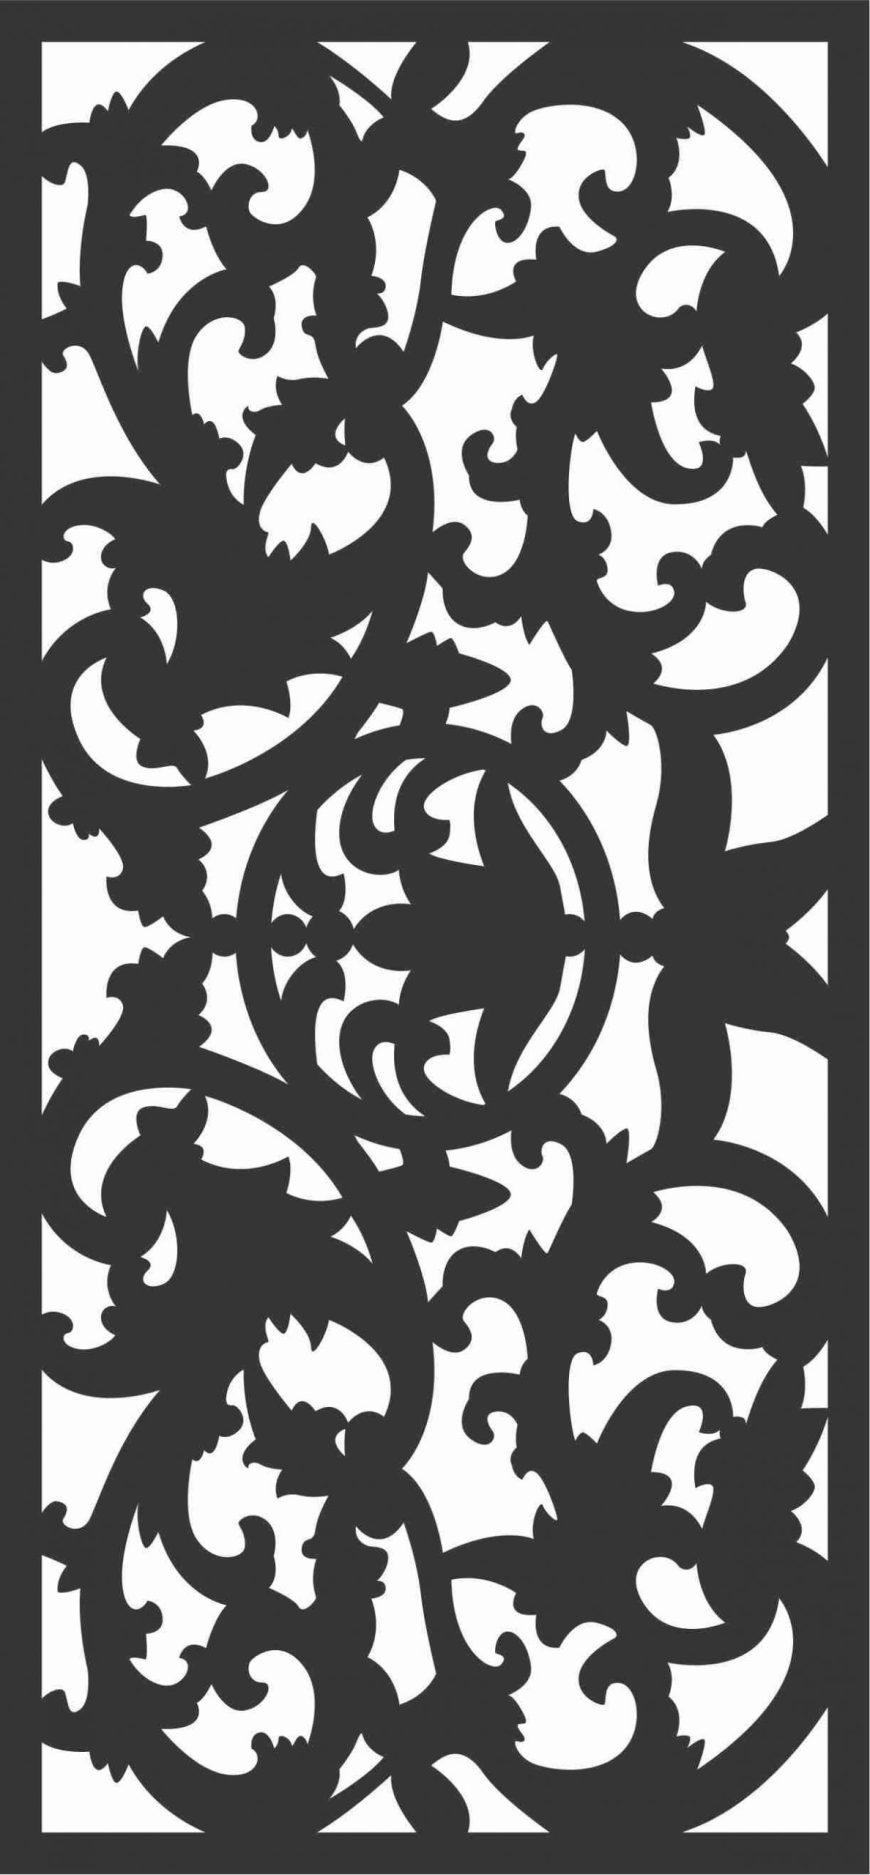 Screen Panel Patterns Seamless 71 Free DXF File